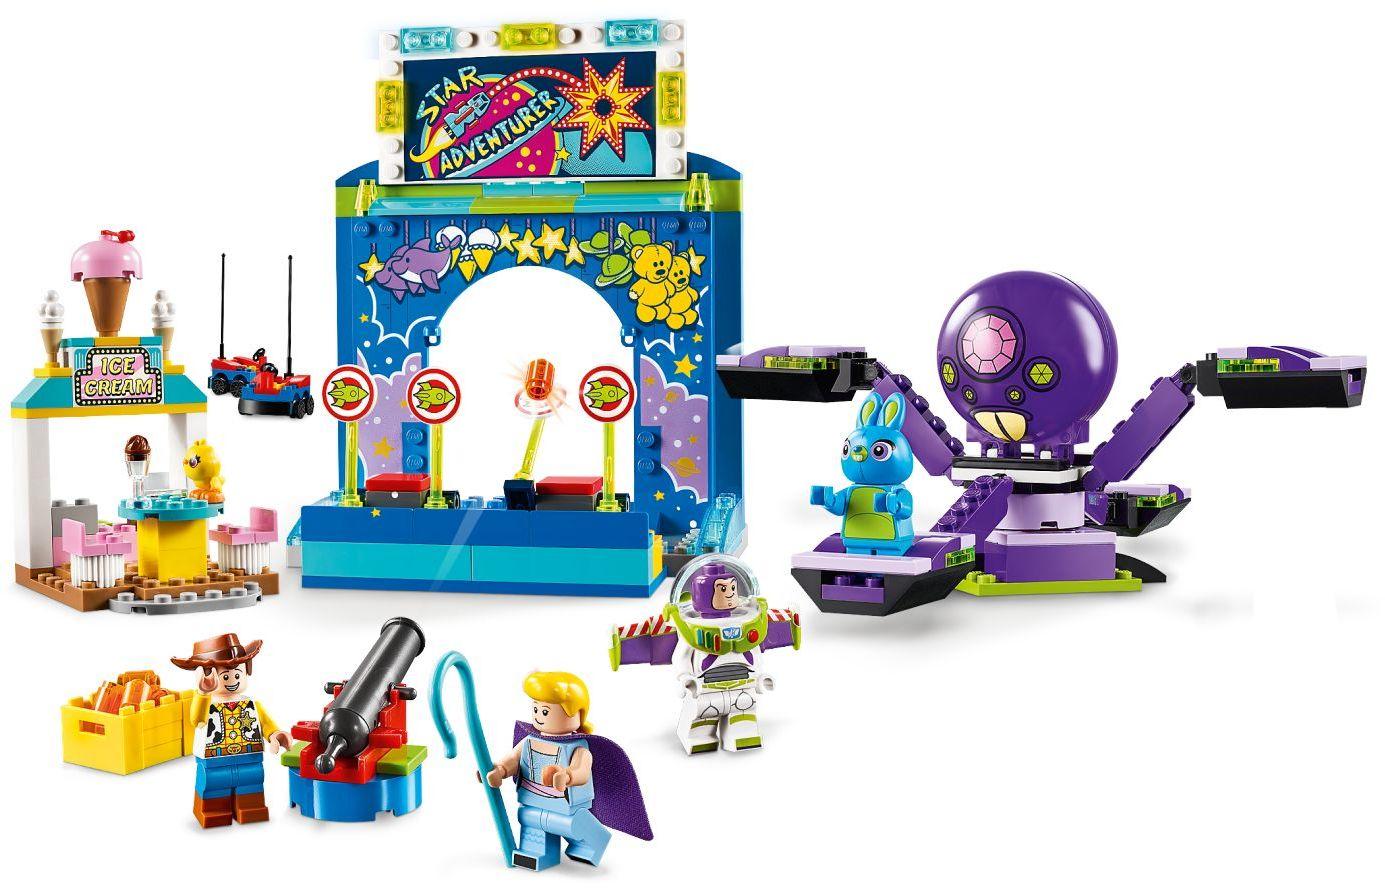 Buzz /& Woody/'s Carnival Mania! Toy Story 4 10770 Lego